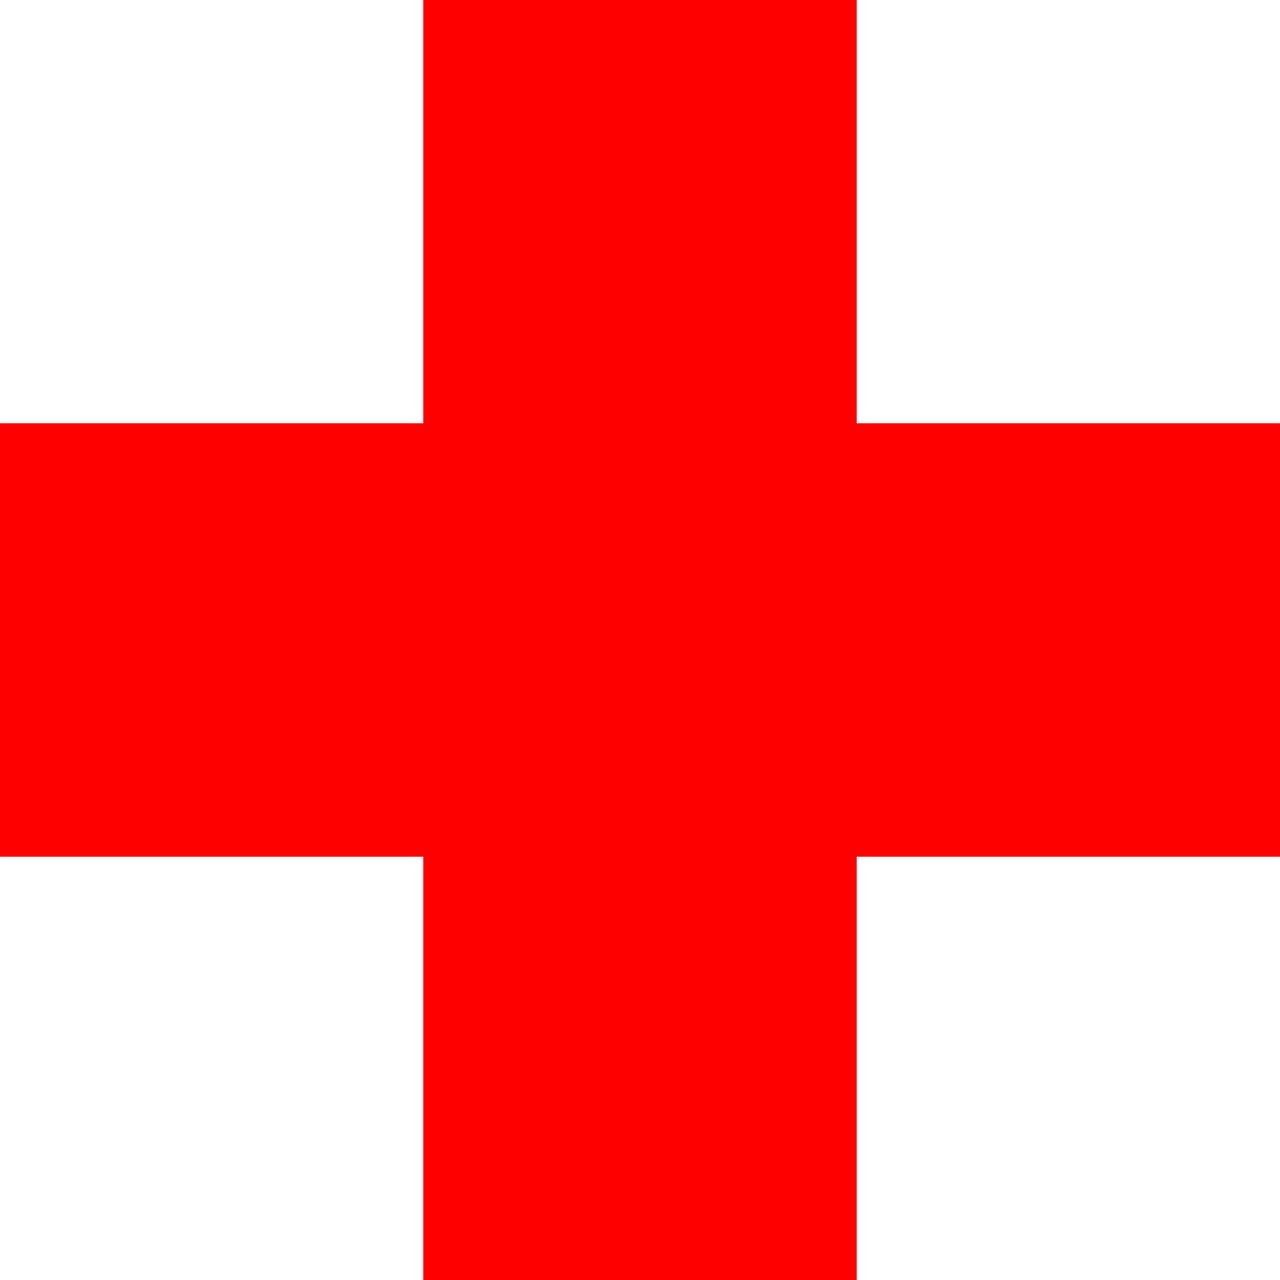 Red, Cross